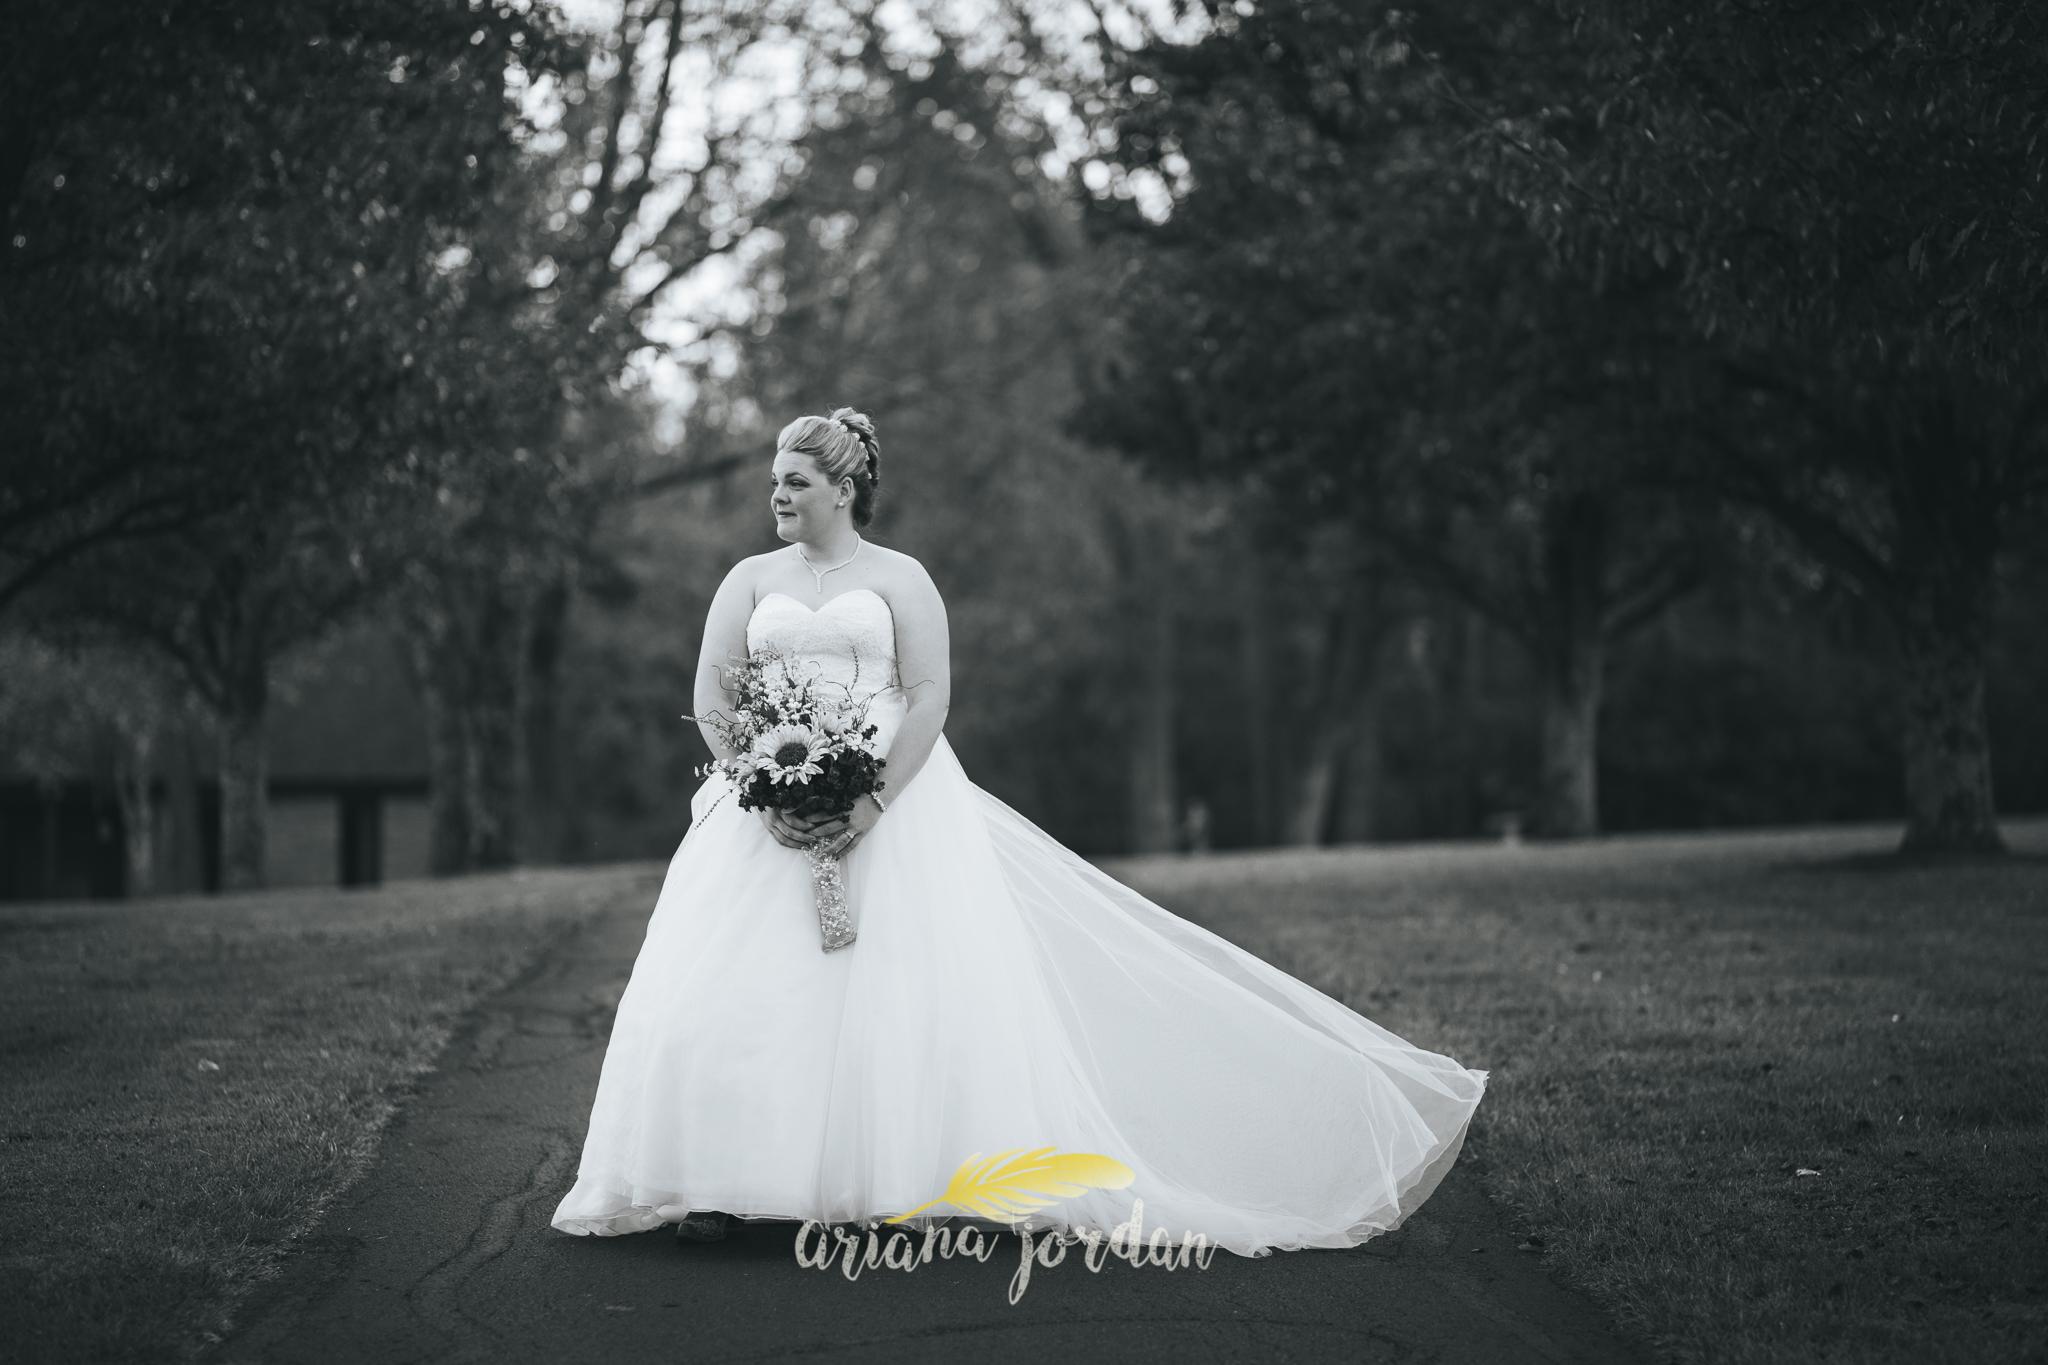 0051 Ariana Jordan Photography - Georgetown KY Wedding Photographer 6676.jpg